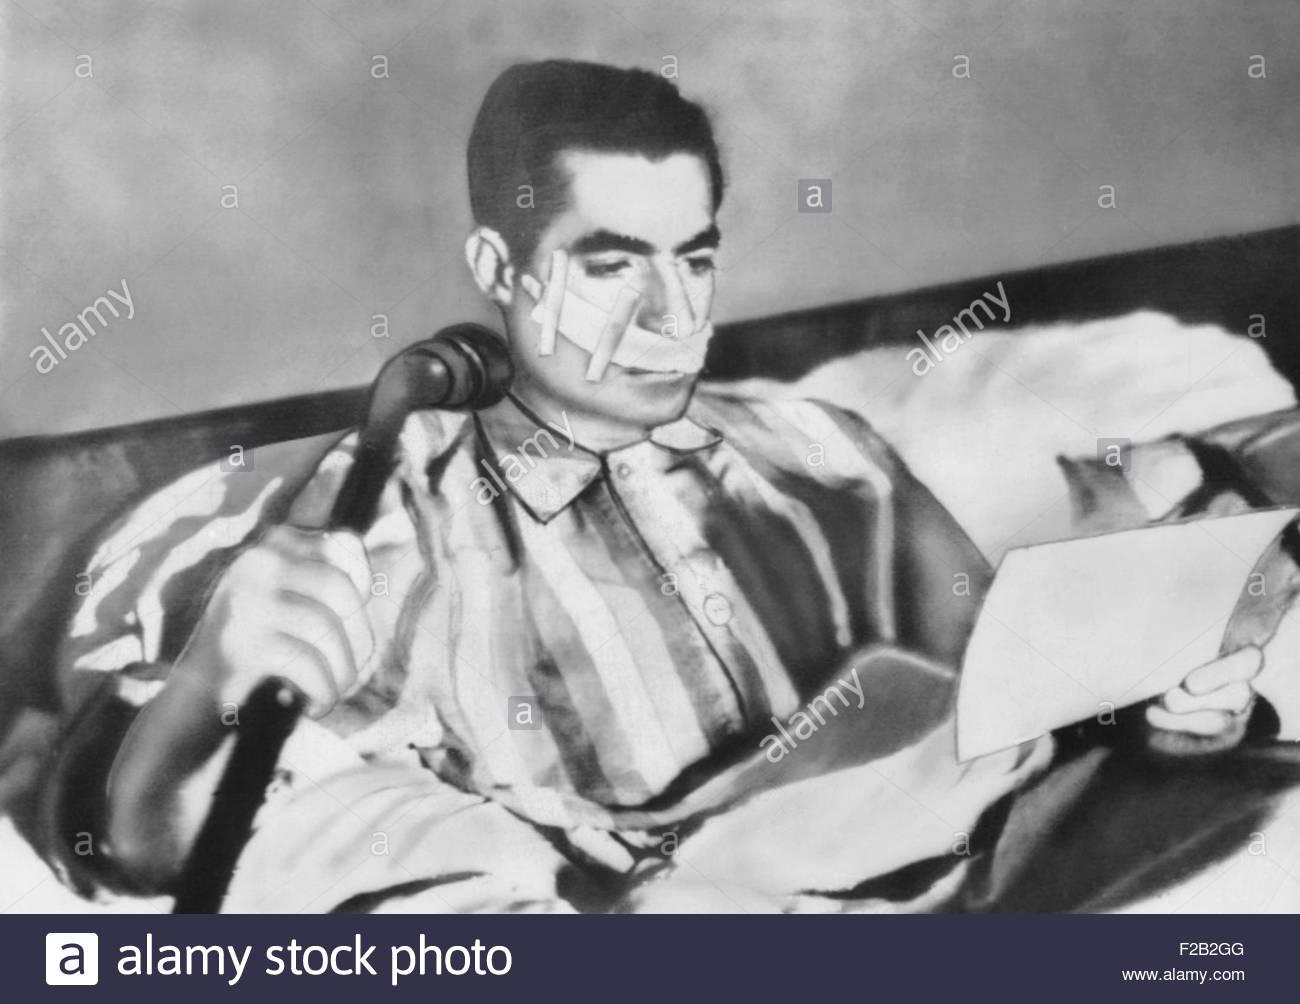 America shah-of-iran-after-an-assassination-attempt-on-feb-4-1949-fakhr-arai-F2B2GG